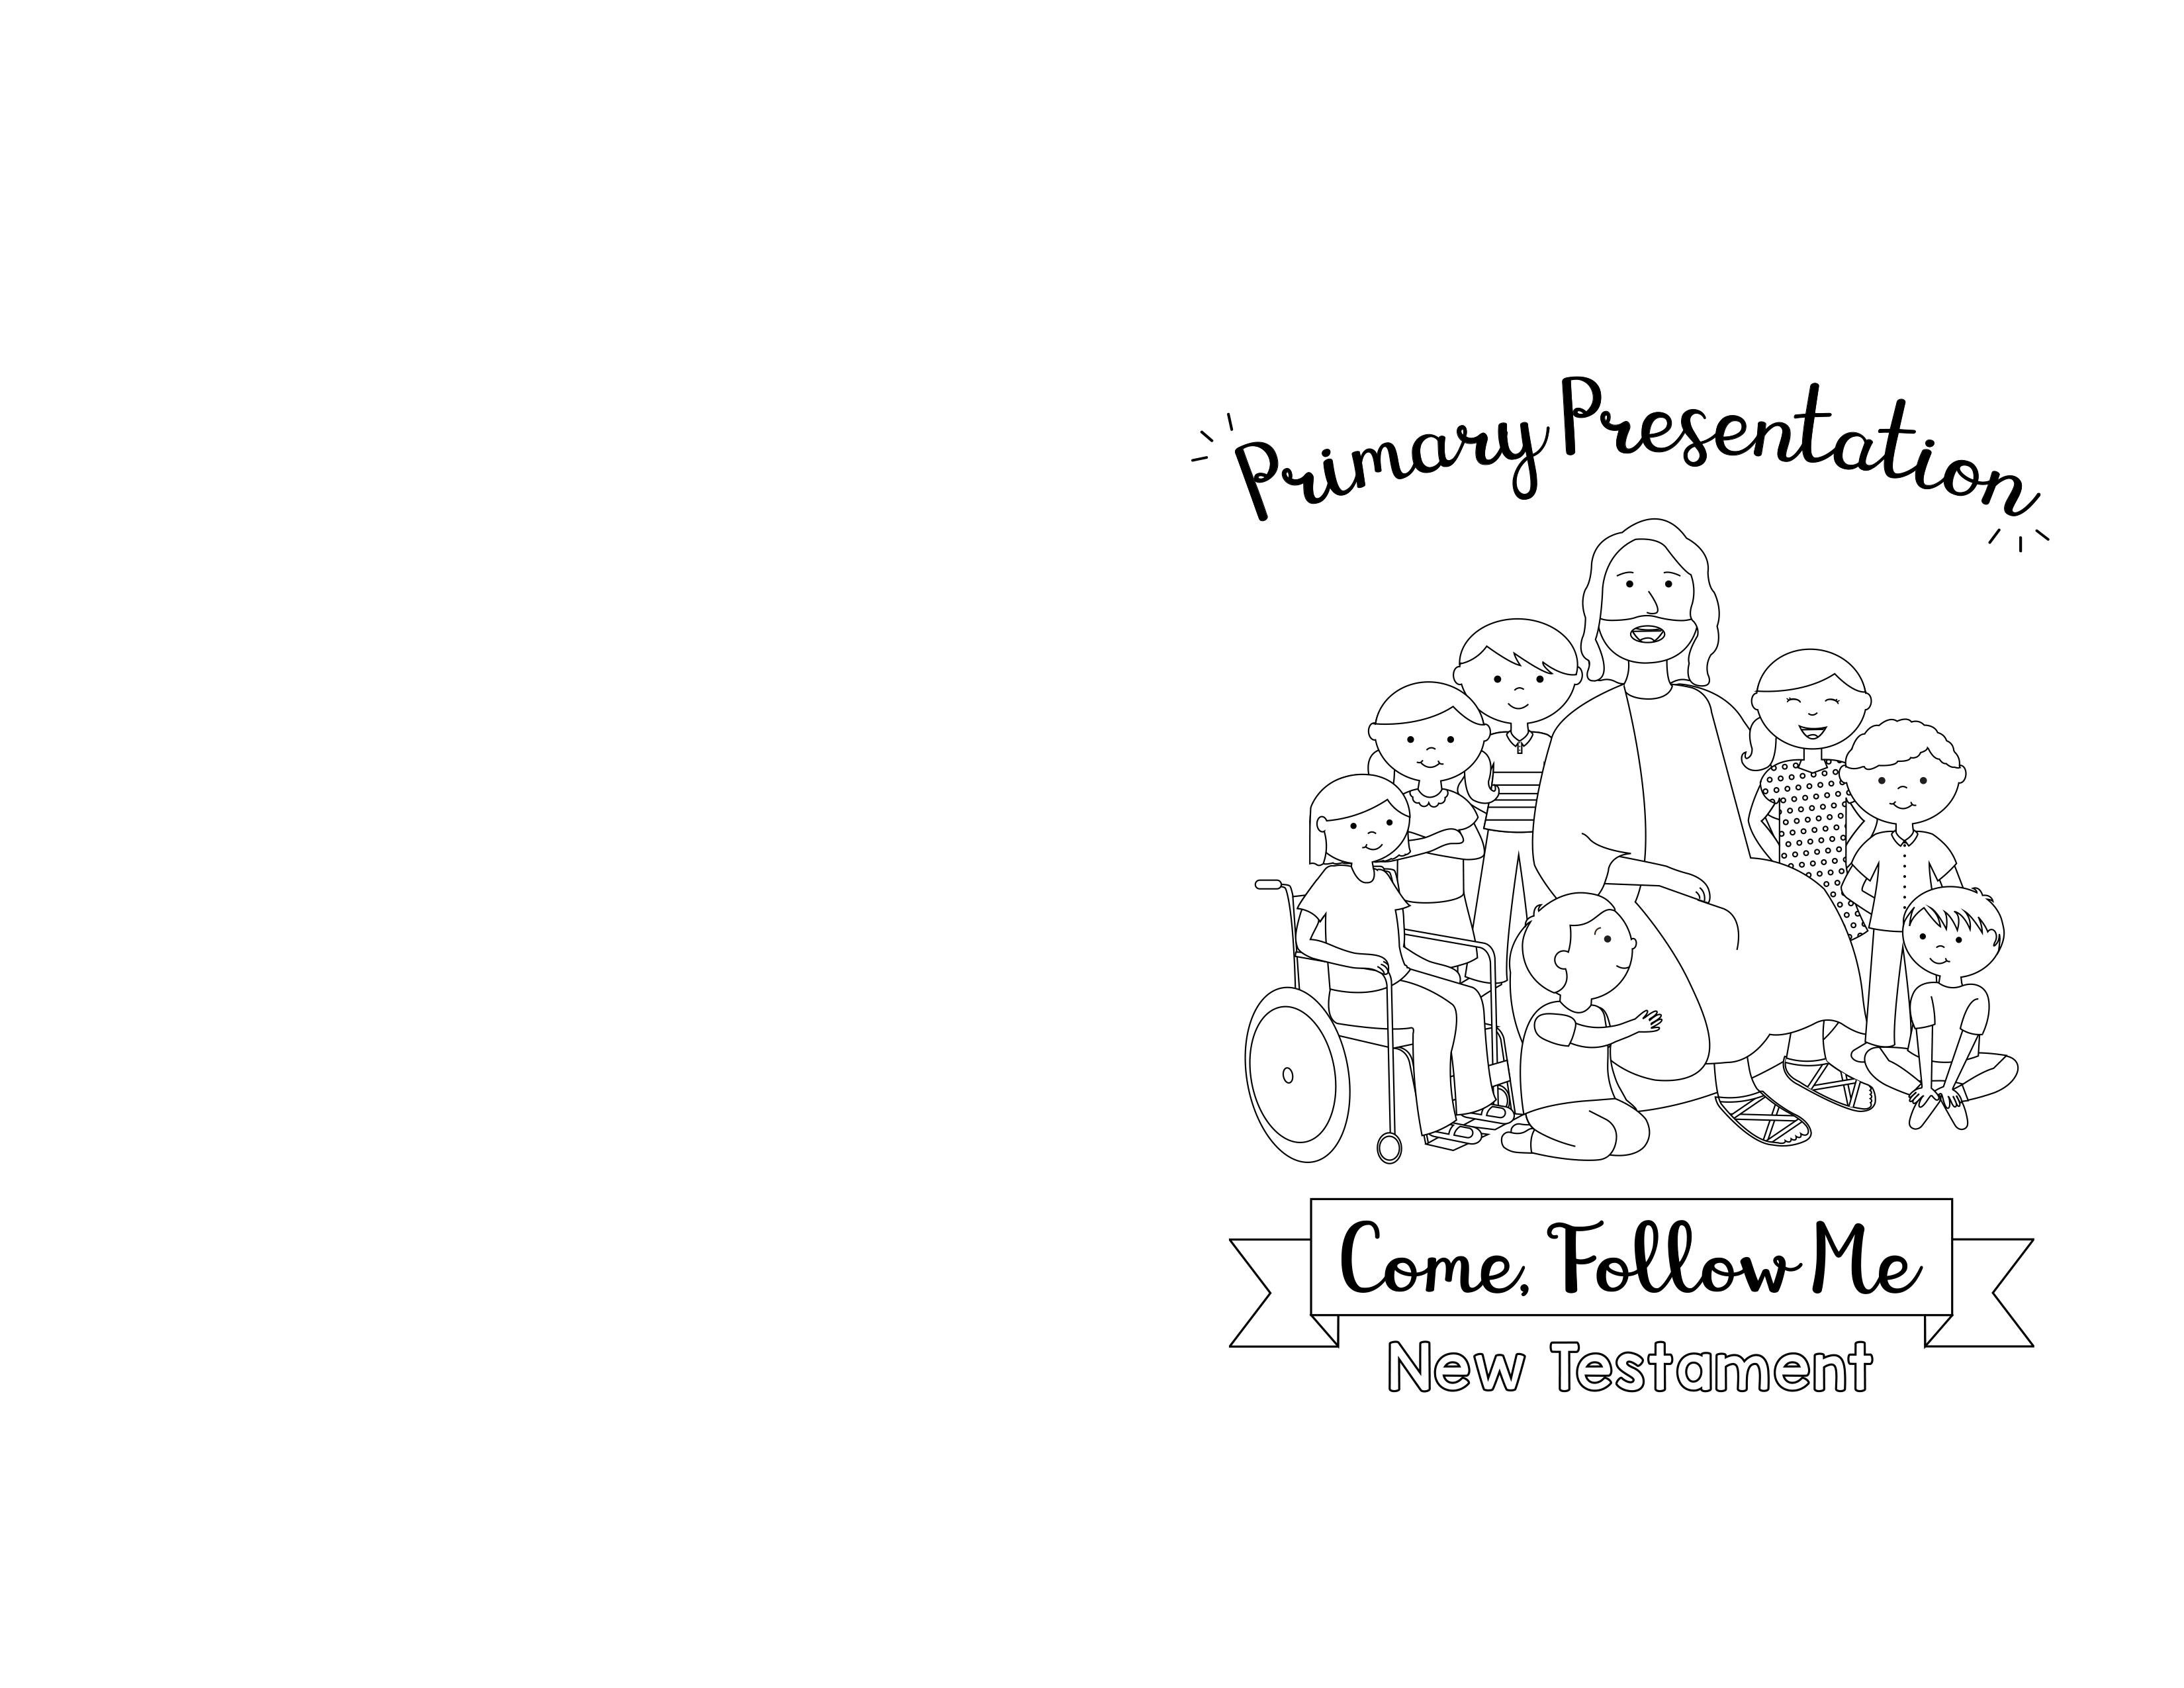 2019 LDS Primary Program Covers for Children\'s Presentation.